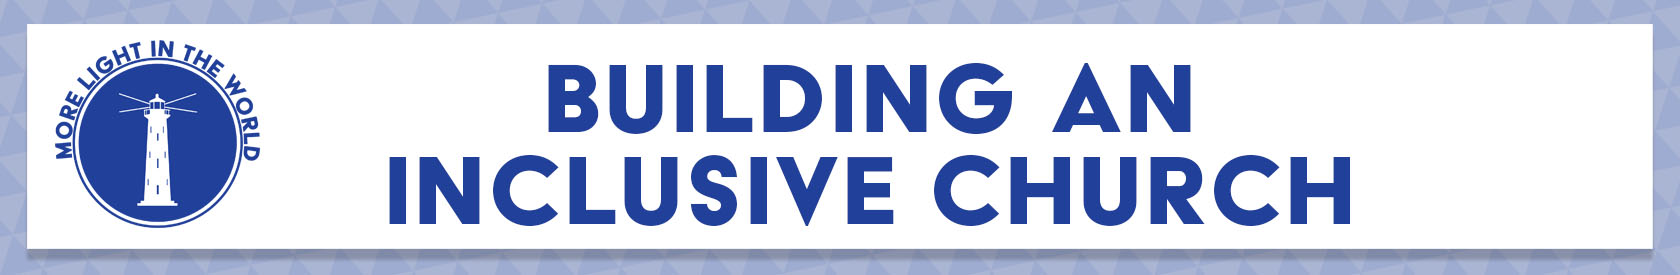 Building an Inclusive Church Training